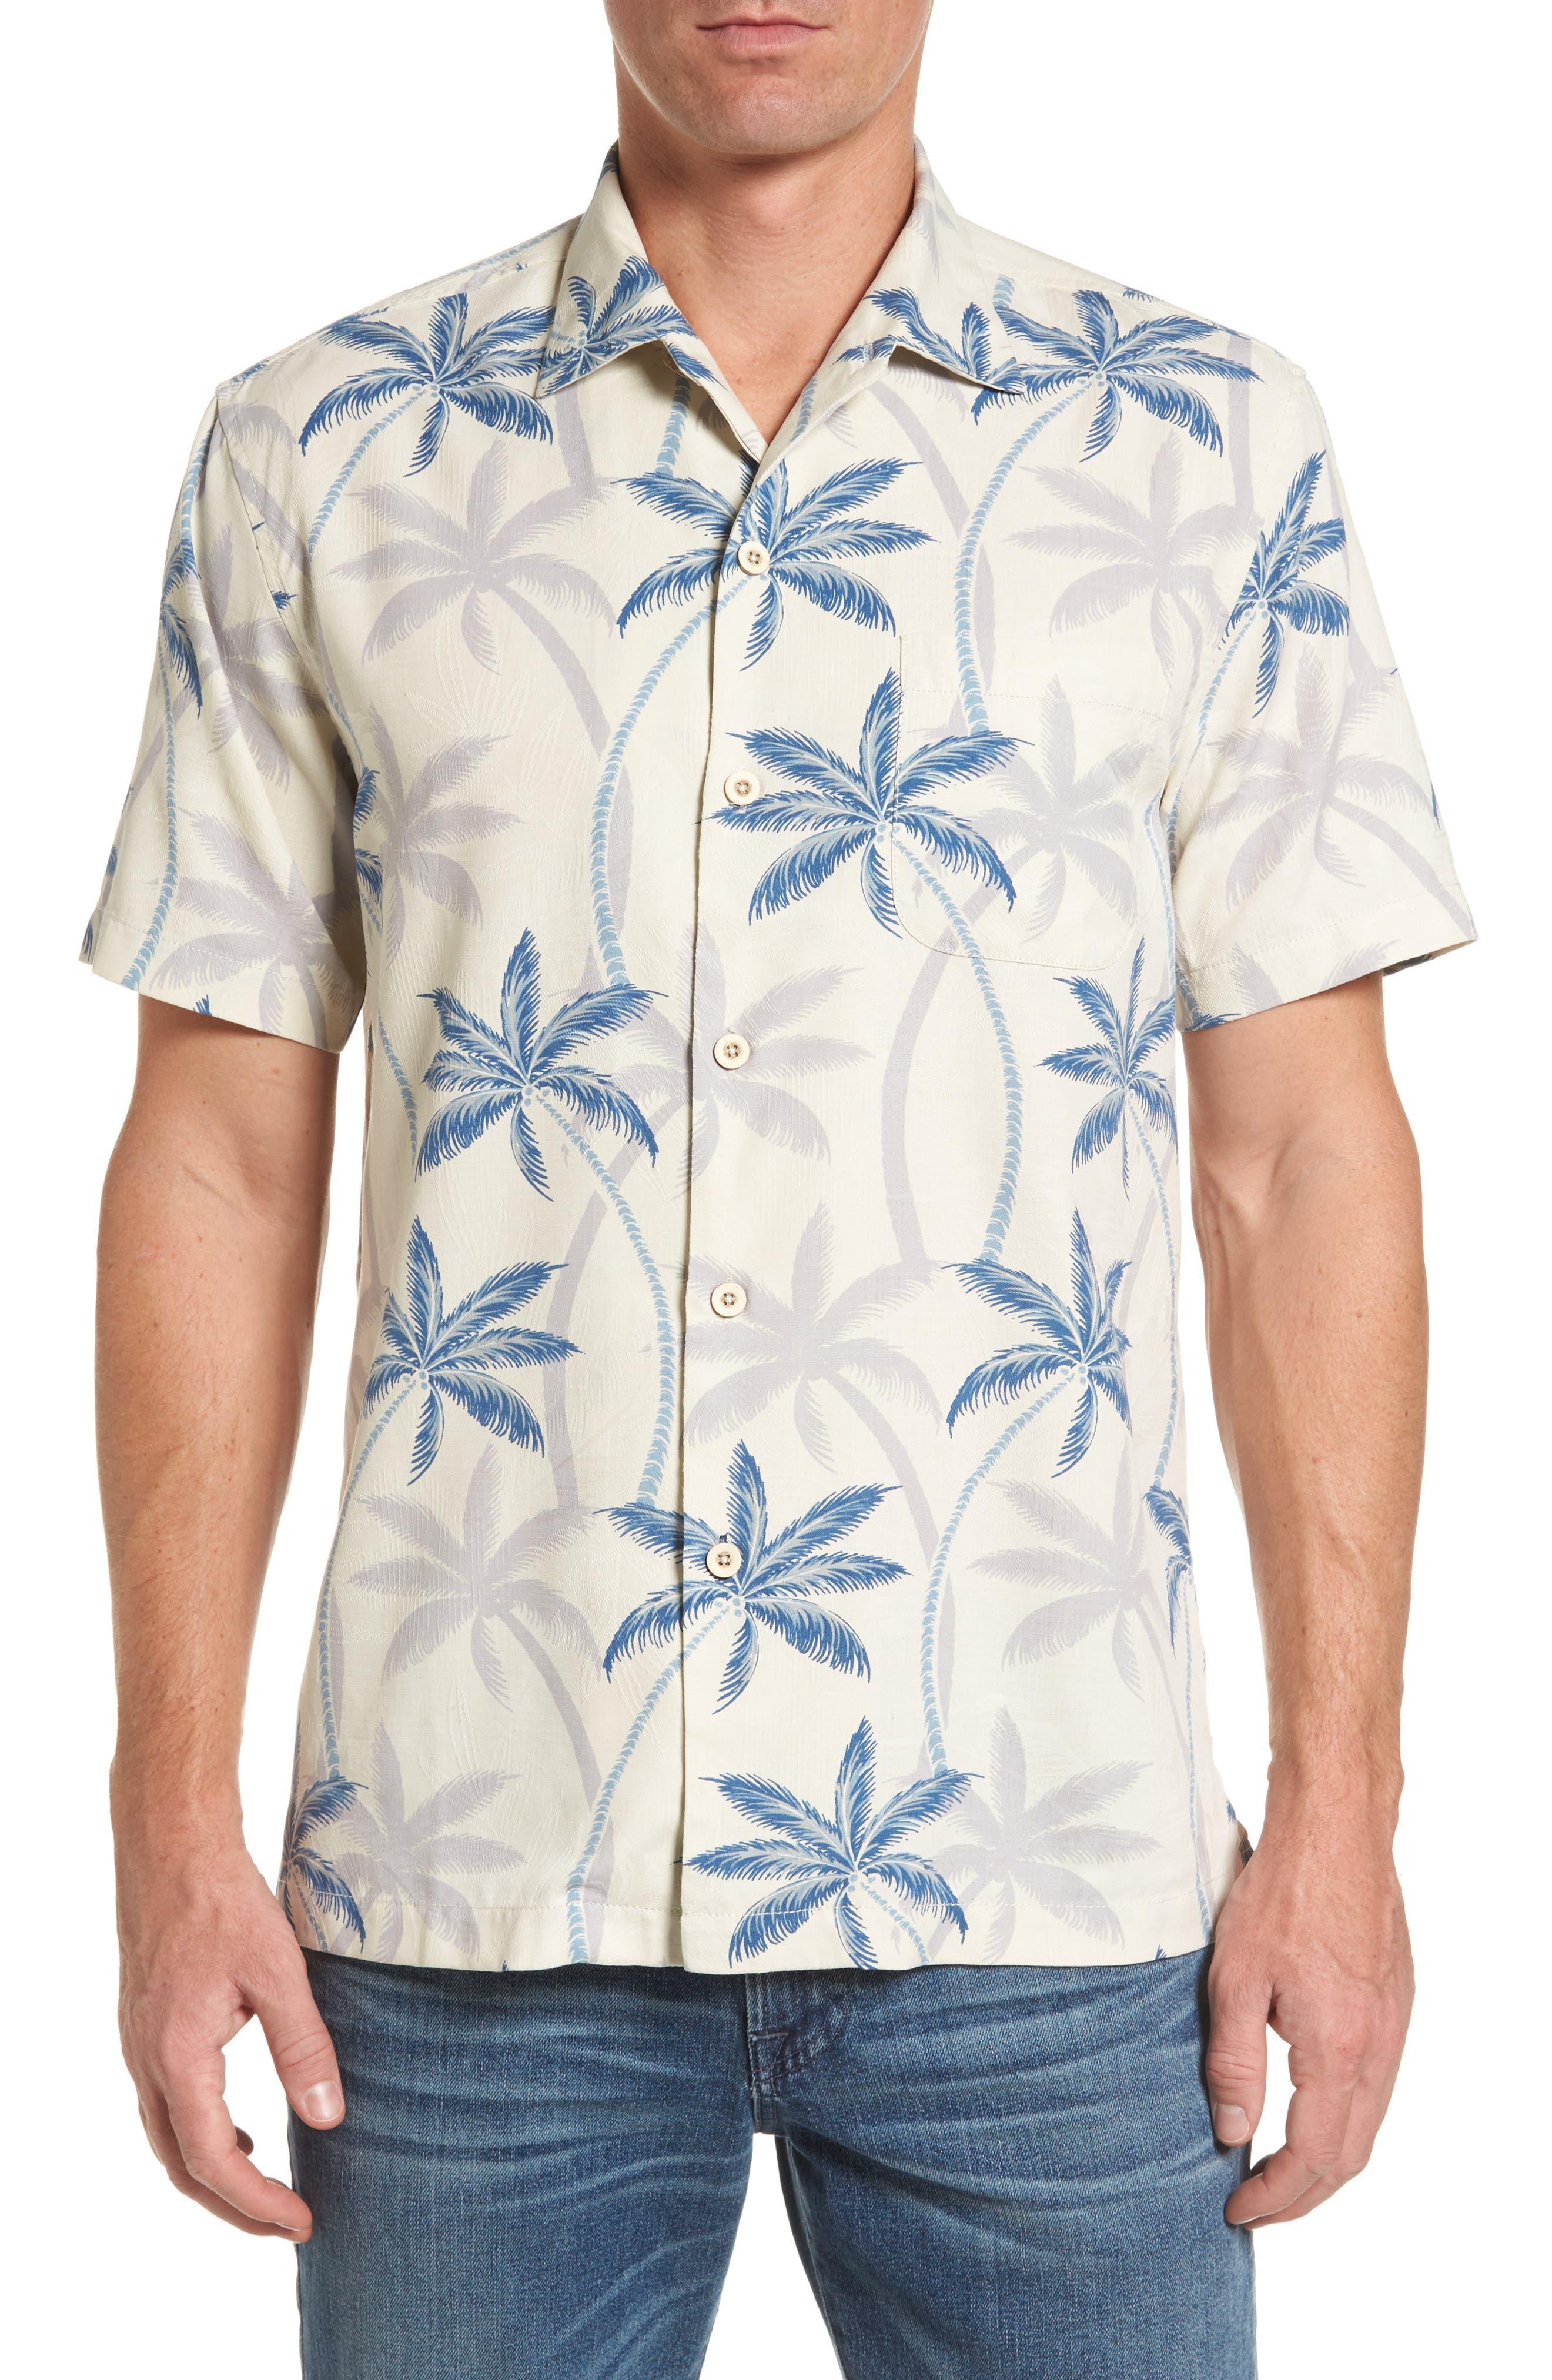 Main Image - Tommy Bahama Palmas Palooza Woven Shirt